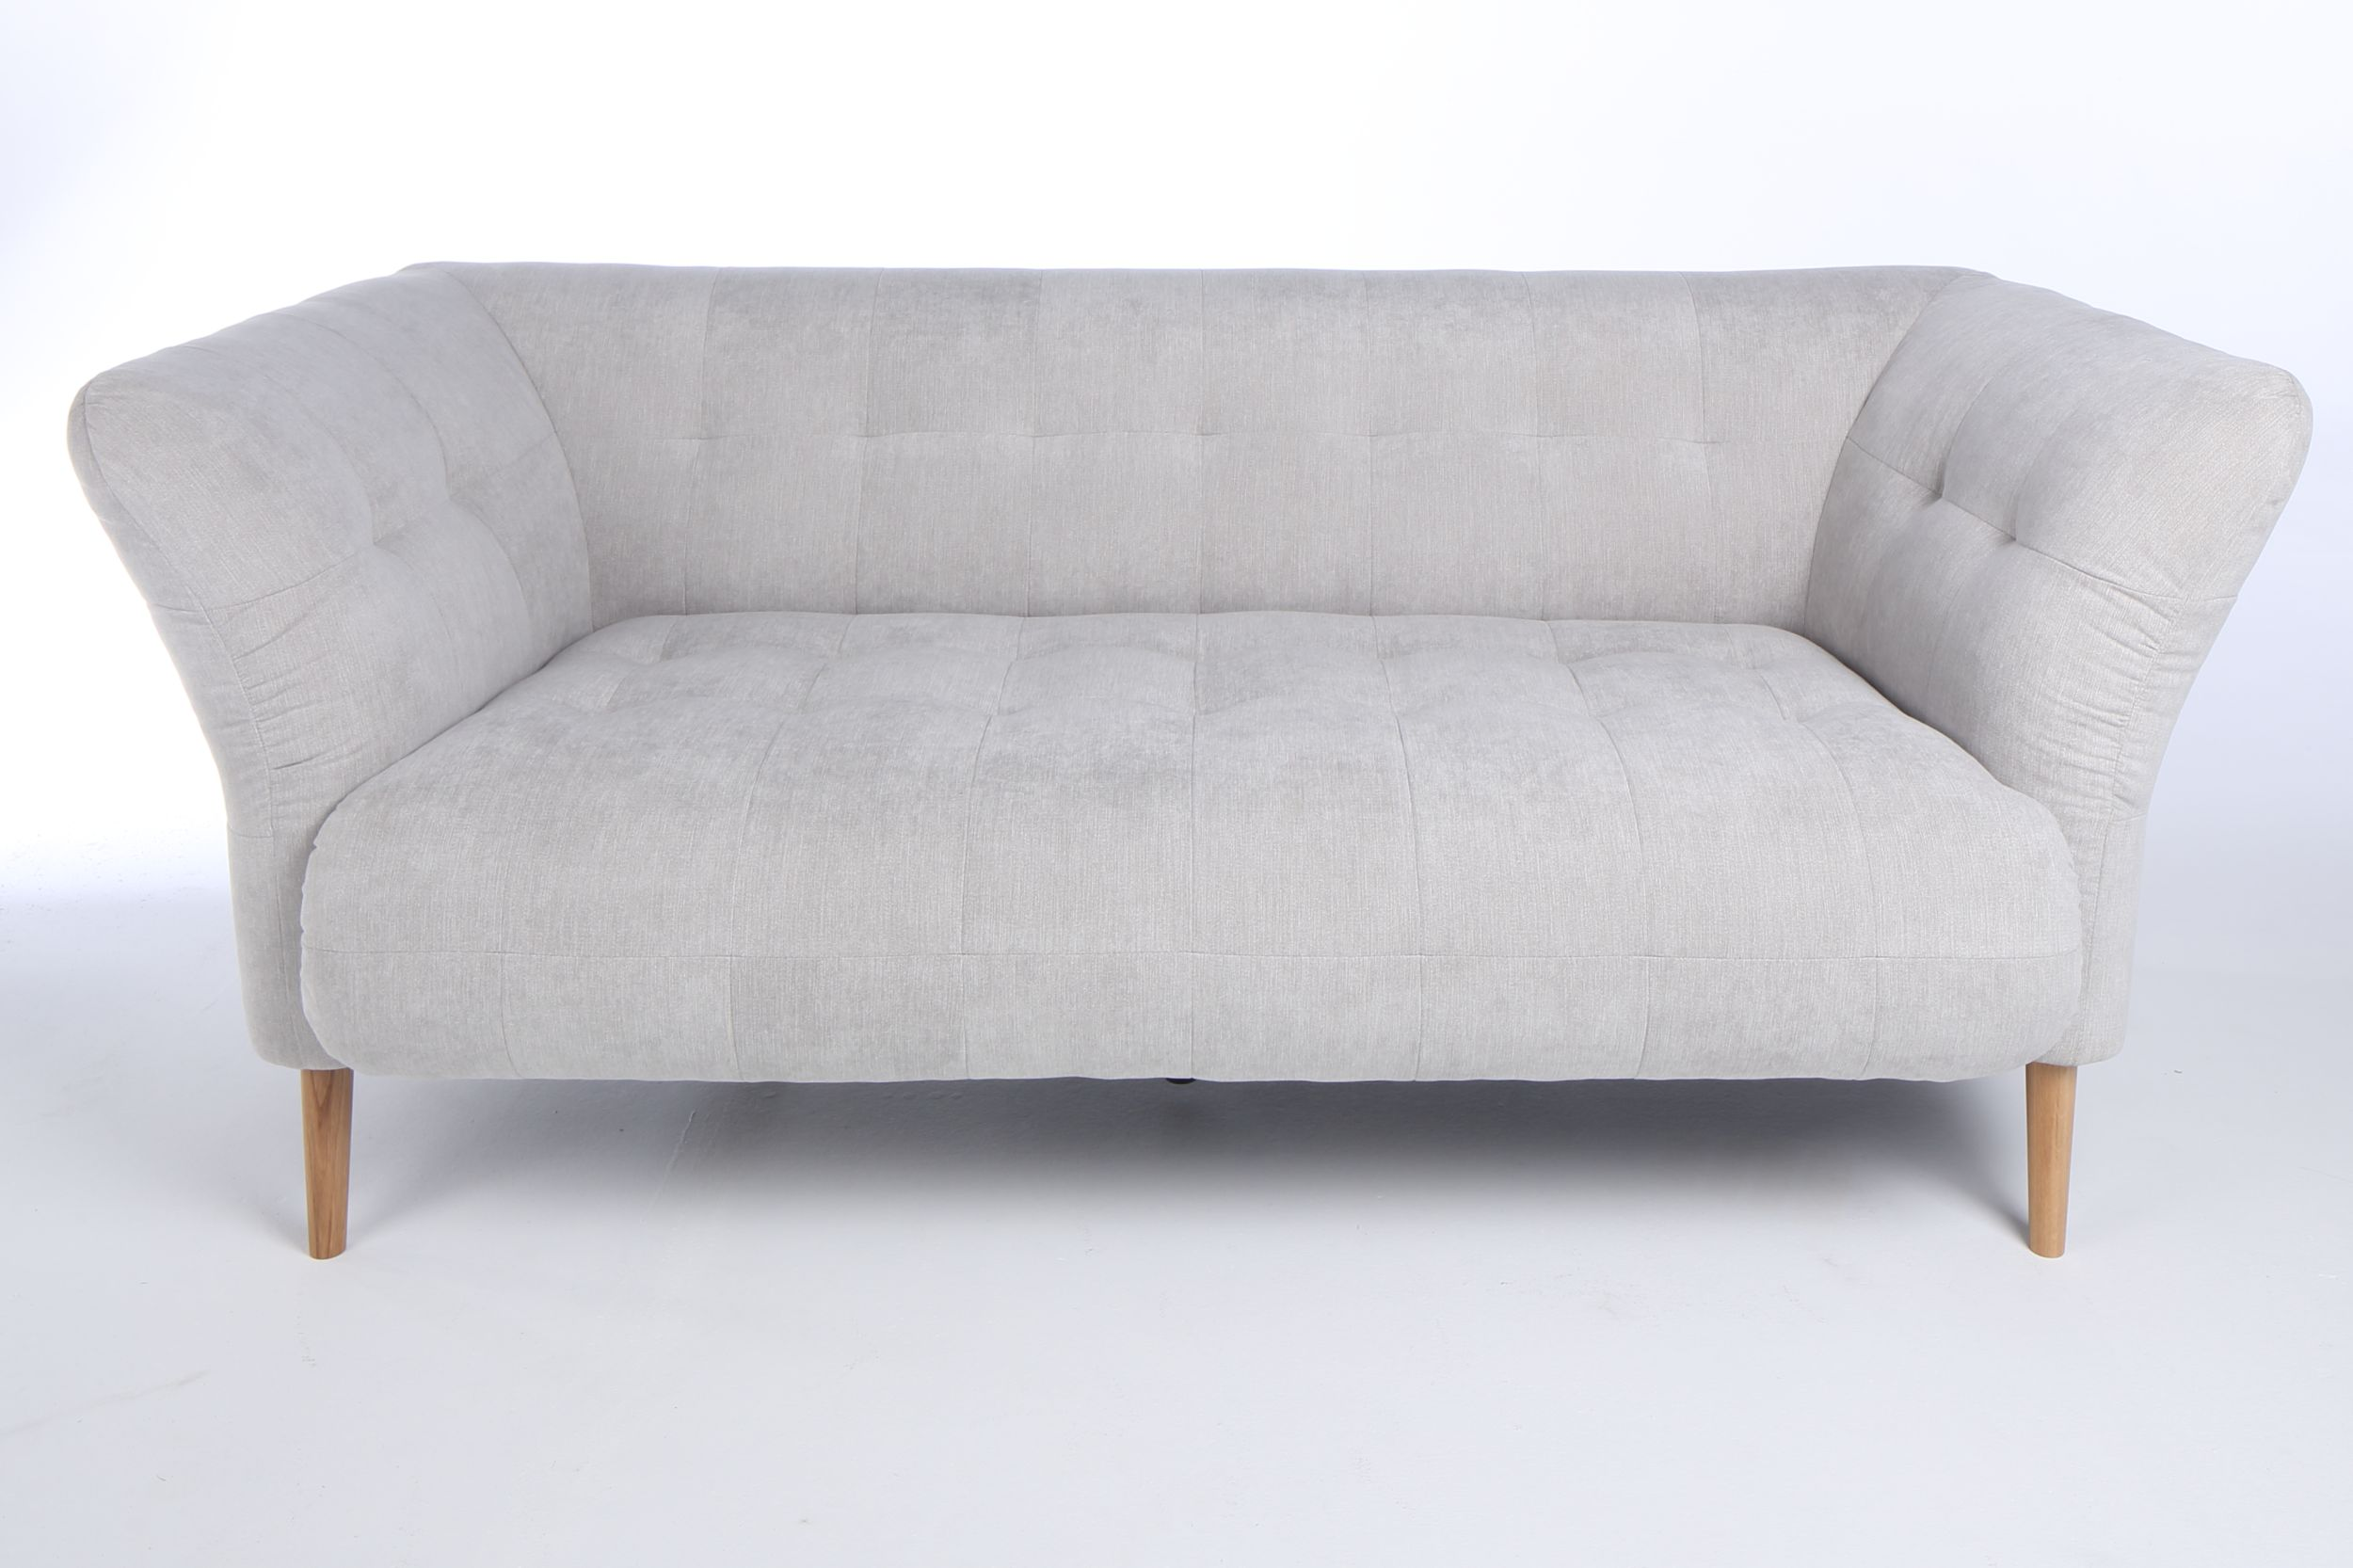 3 sitzer sofa in hellgrau m belhaus pohl wilhelmshaven friesland m belhaus pohl gmbh. Black Bedroom Furniture Sets. Home Design Ideas